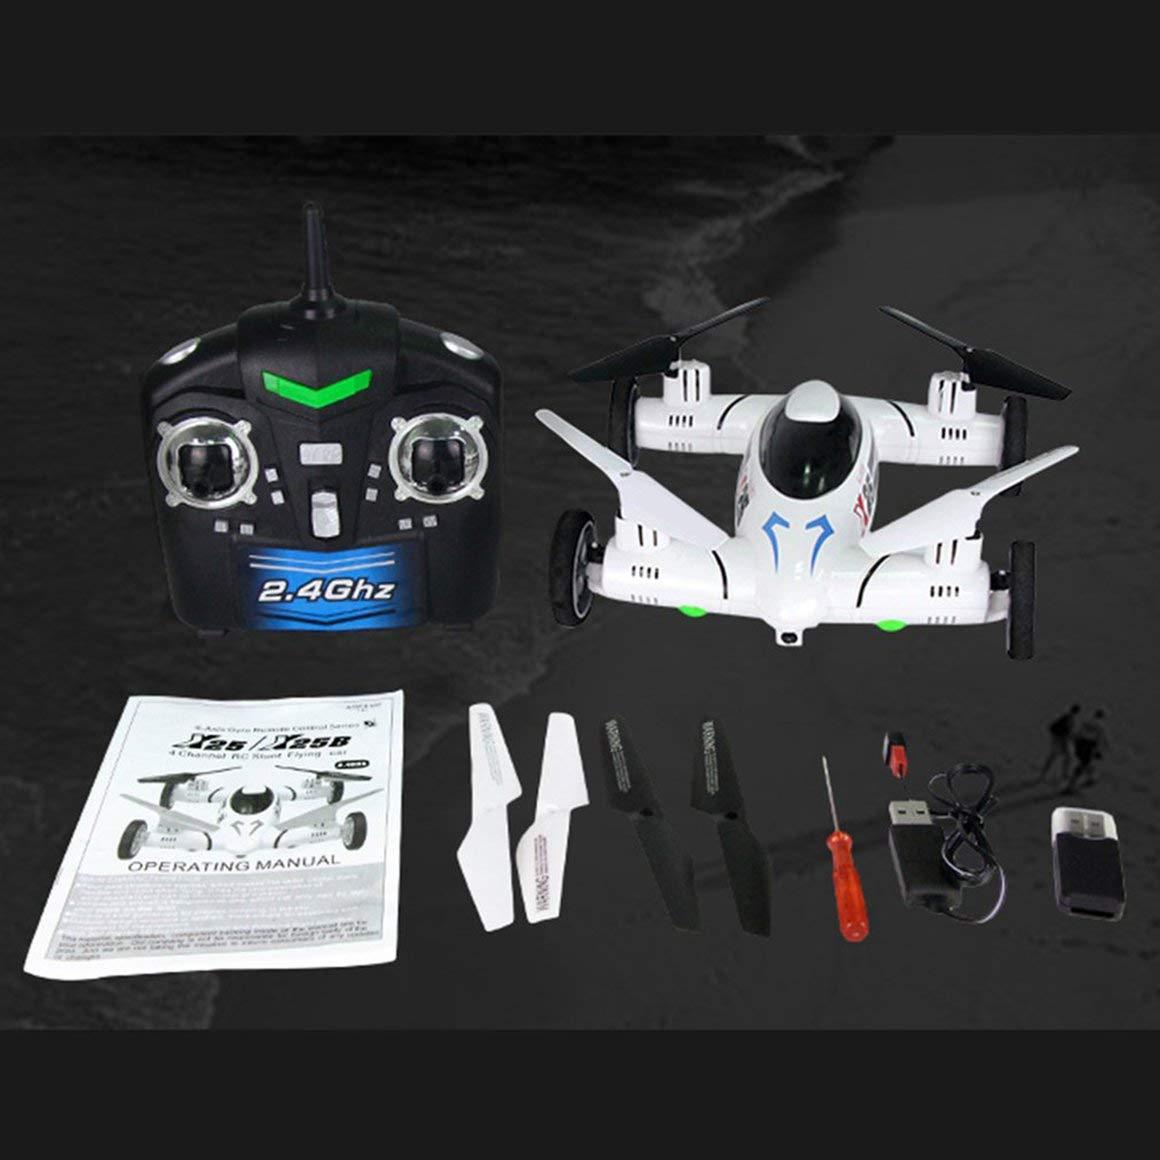 Funnyrunstore X25 720P HD Camera Smart RC Flying Car Drone Quadcopter Aircraft UAV con 360 ° Flip Altitude Hold 0ne Key Return, - (Bianco)